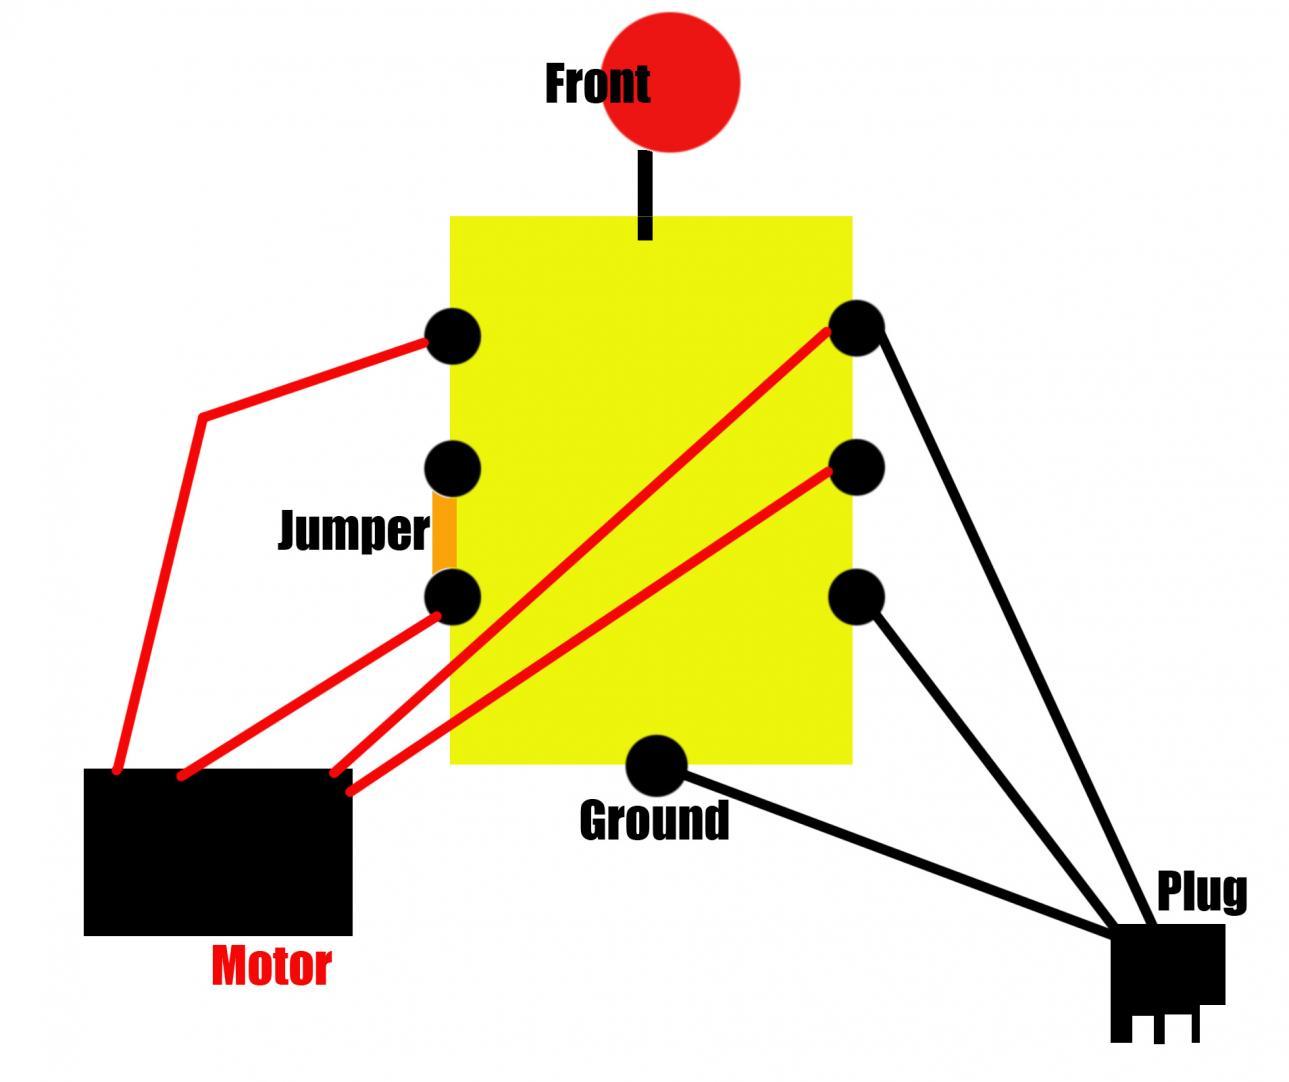 hight resolution of  wiring dsc03621 jpg motor ge jpg